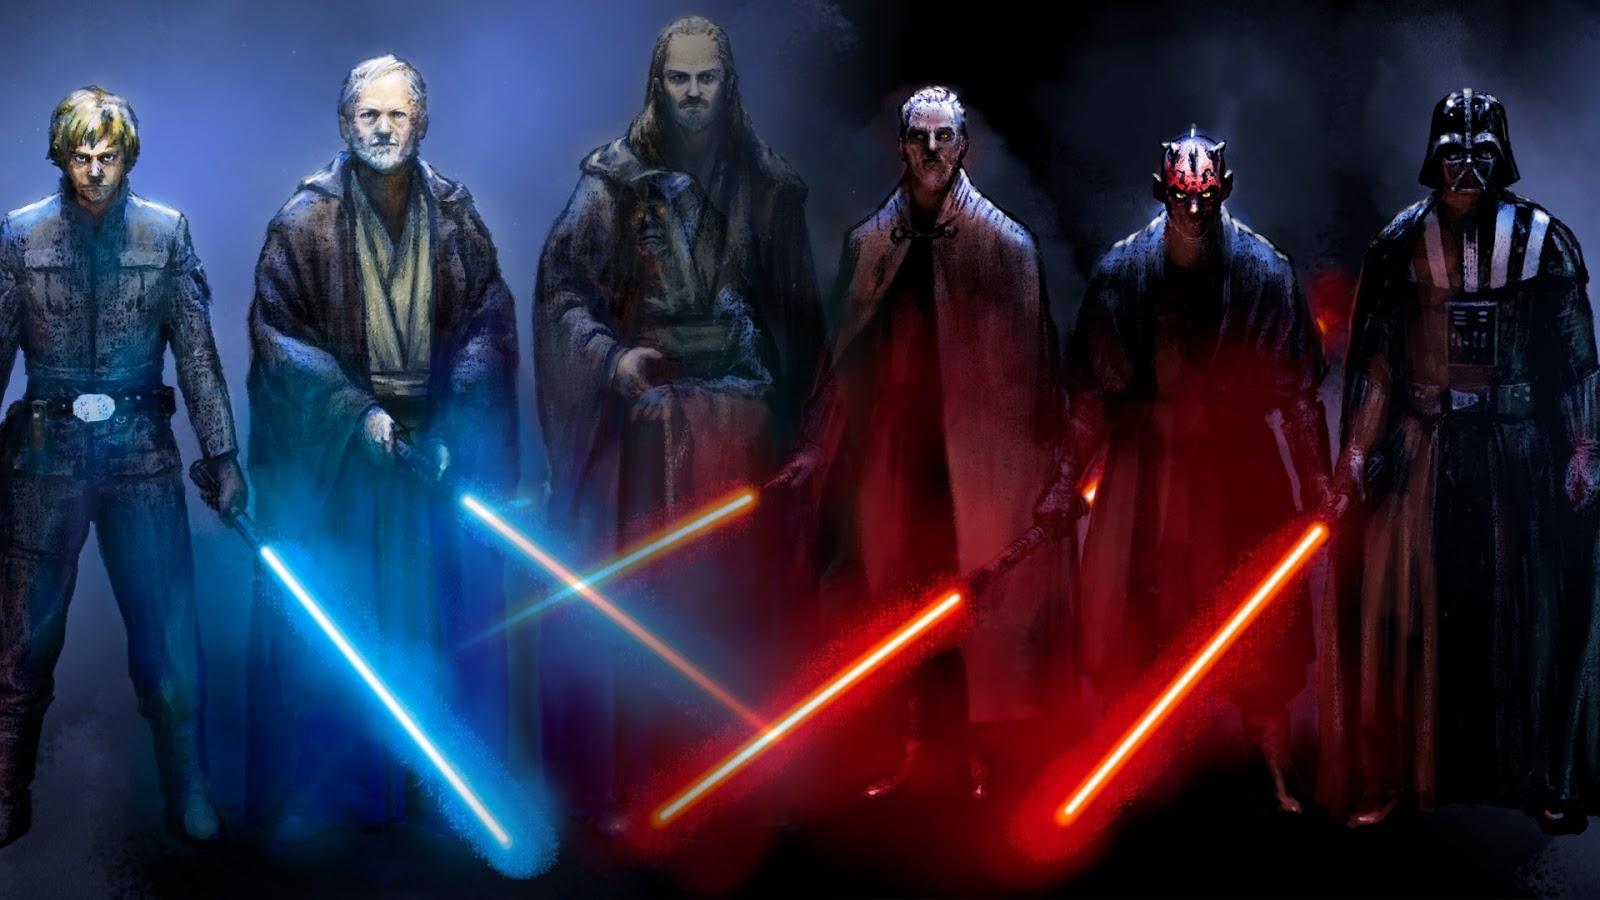 All Hd Wallpapers Star Wars Rebels Hd Wallpapers